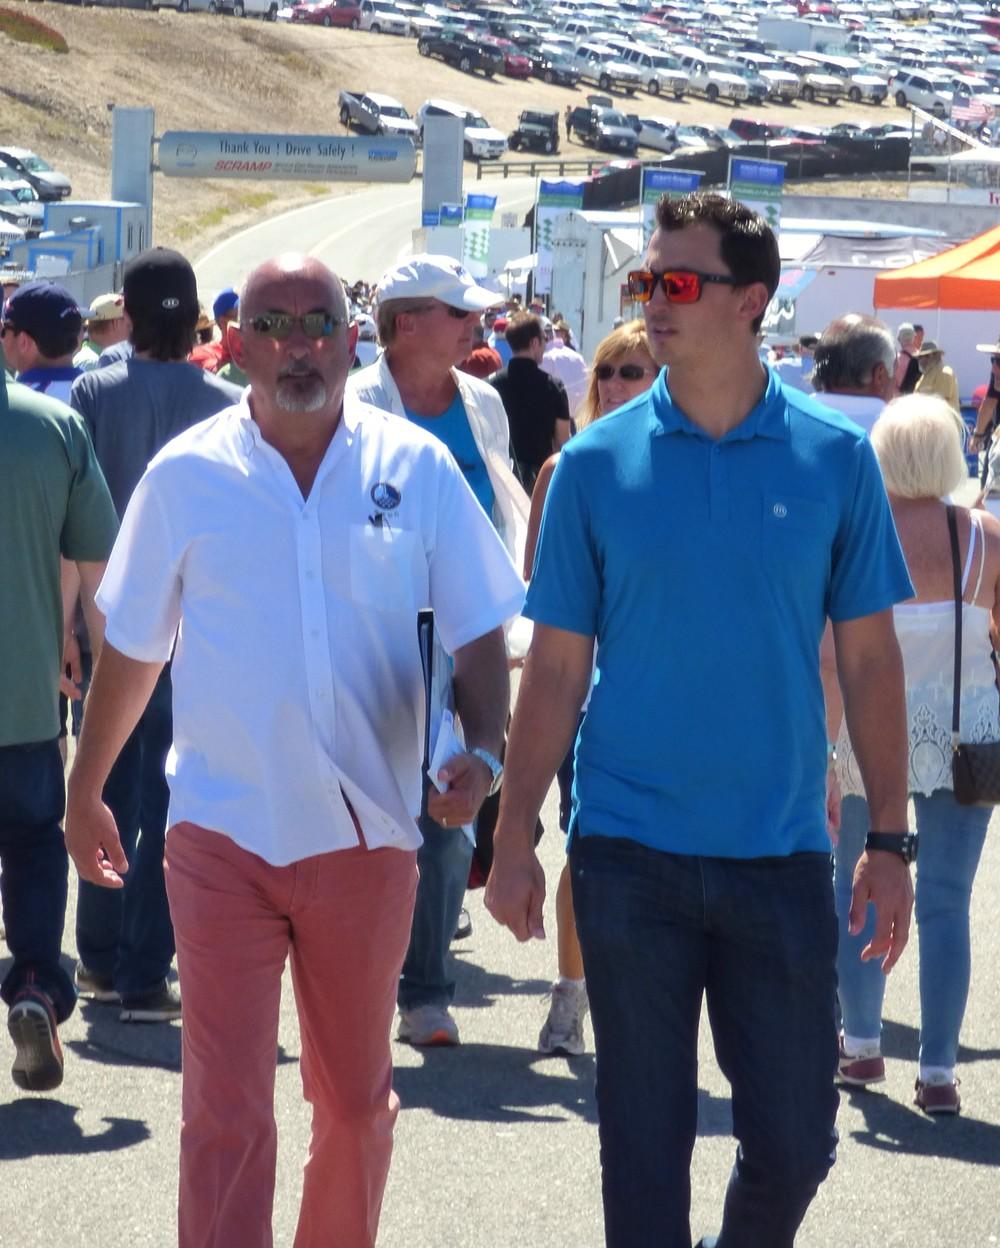 Father and son racing powerhouse, Bobby and Graham Rahal.